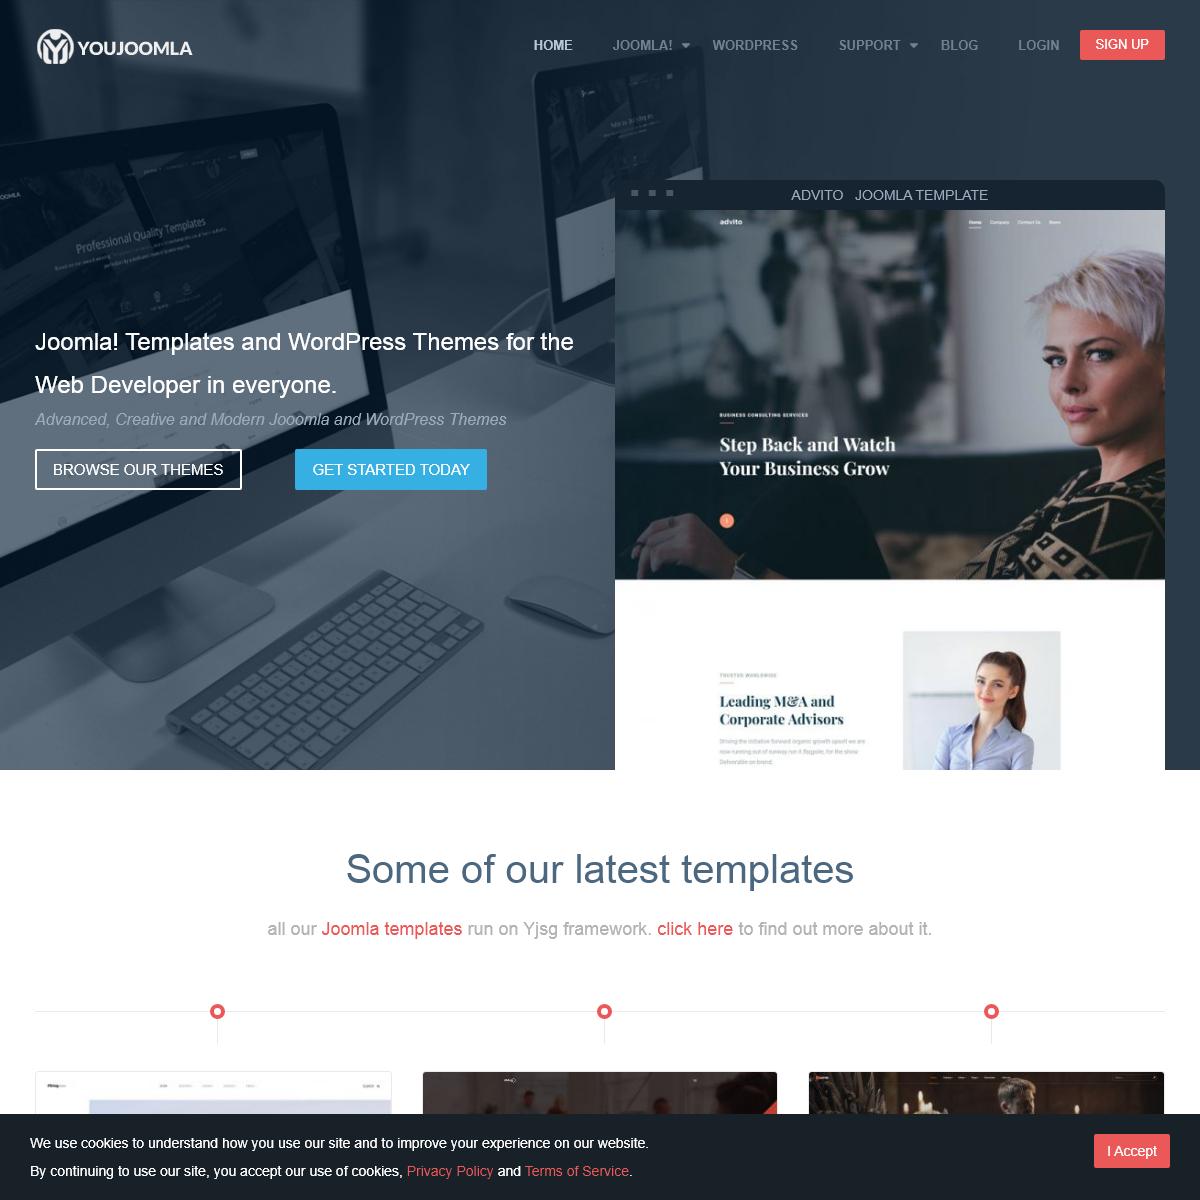 Professional Joomla Templates,WordPress Themes - Joomla Templates Club